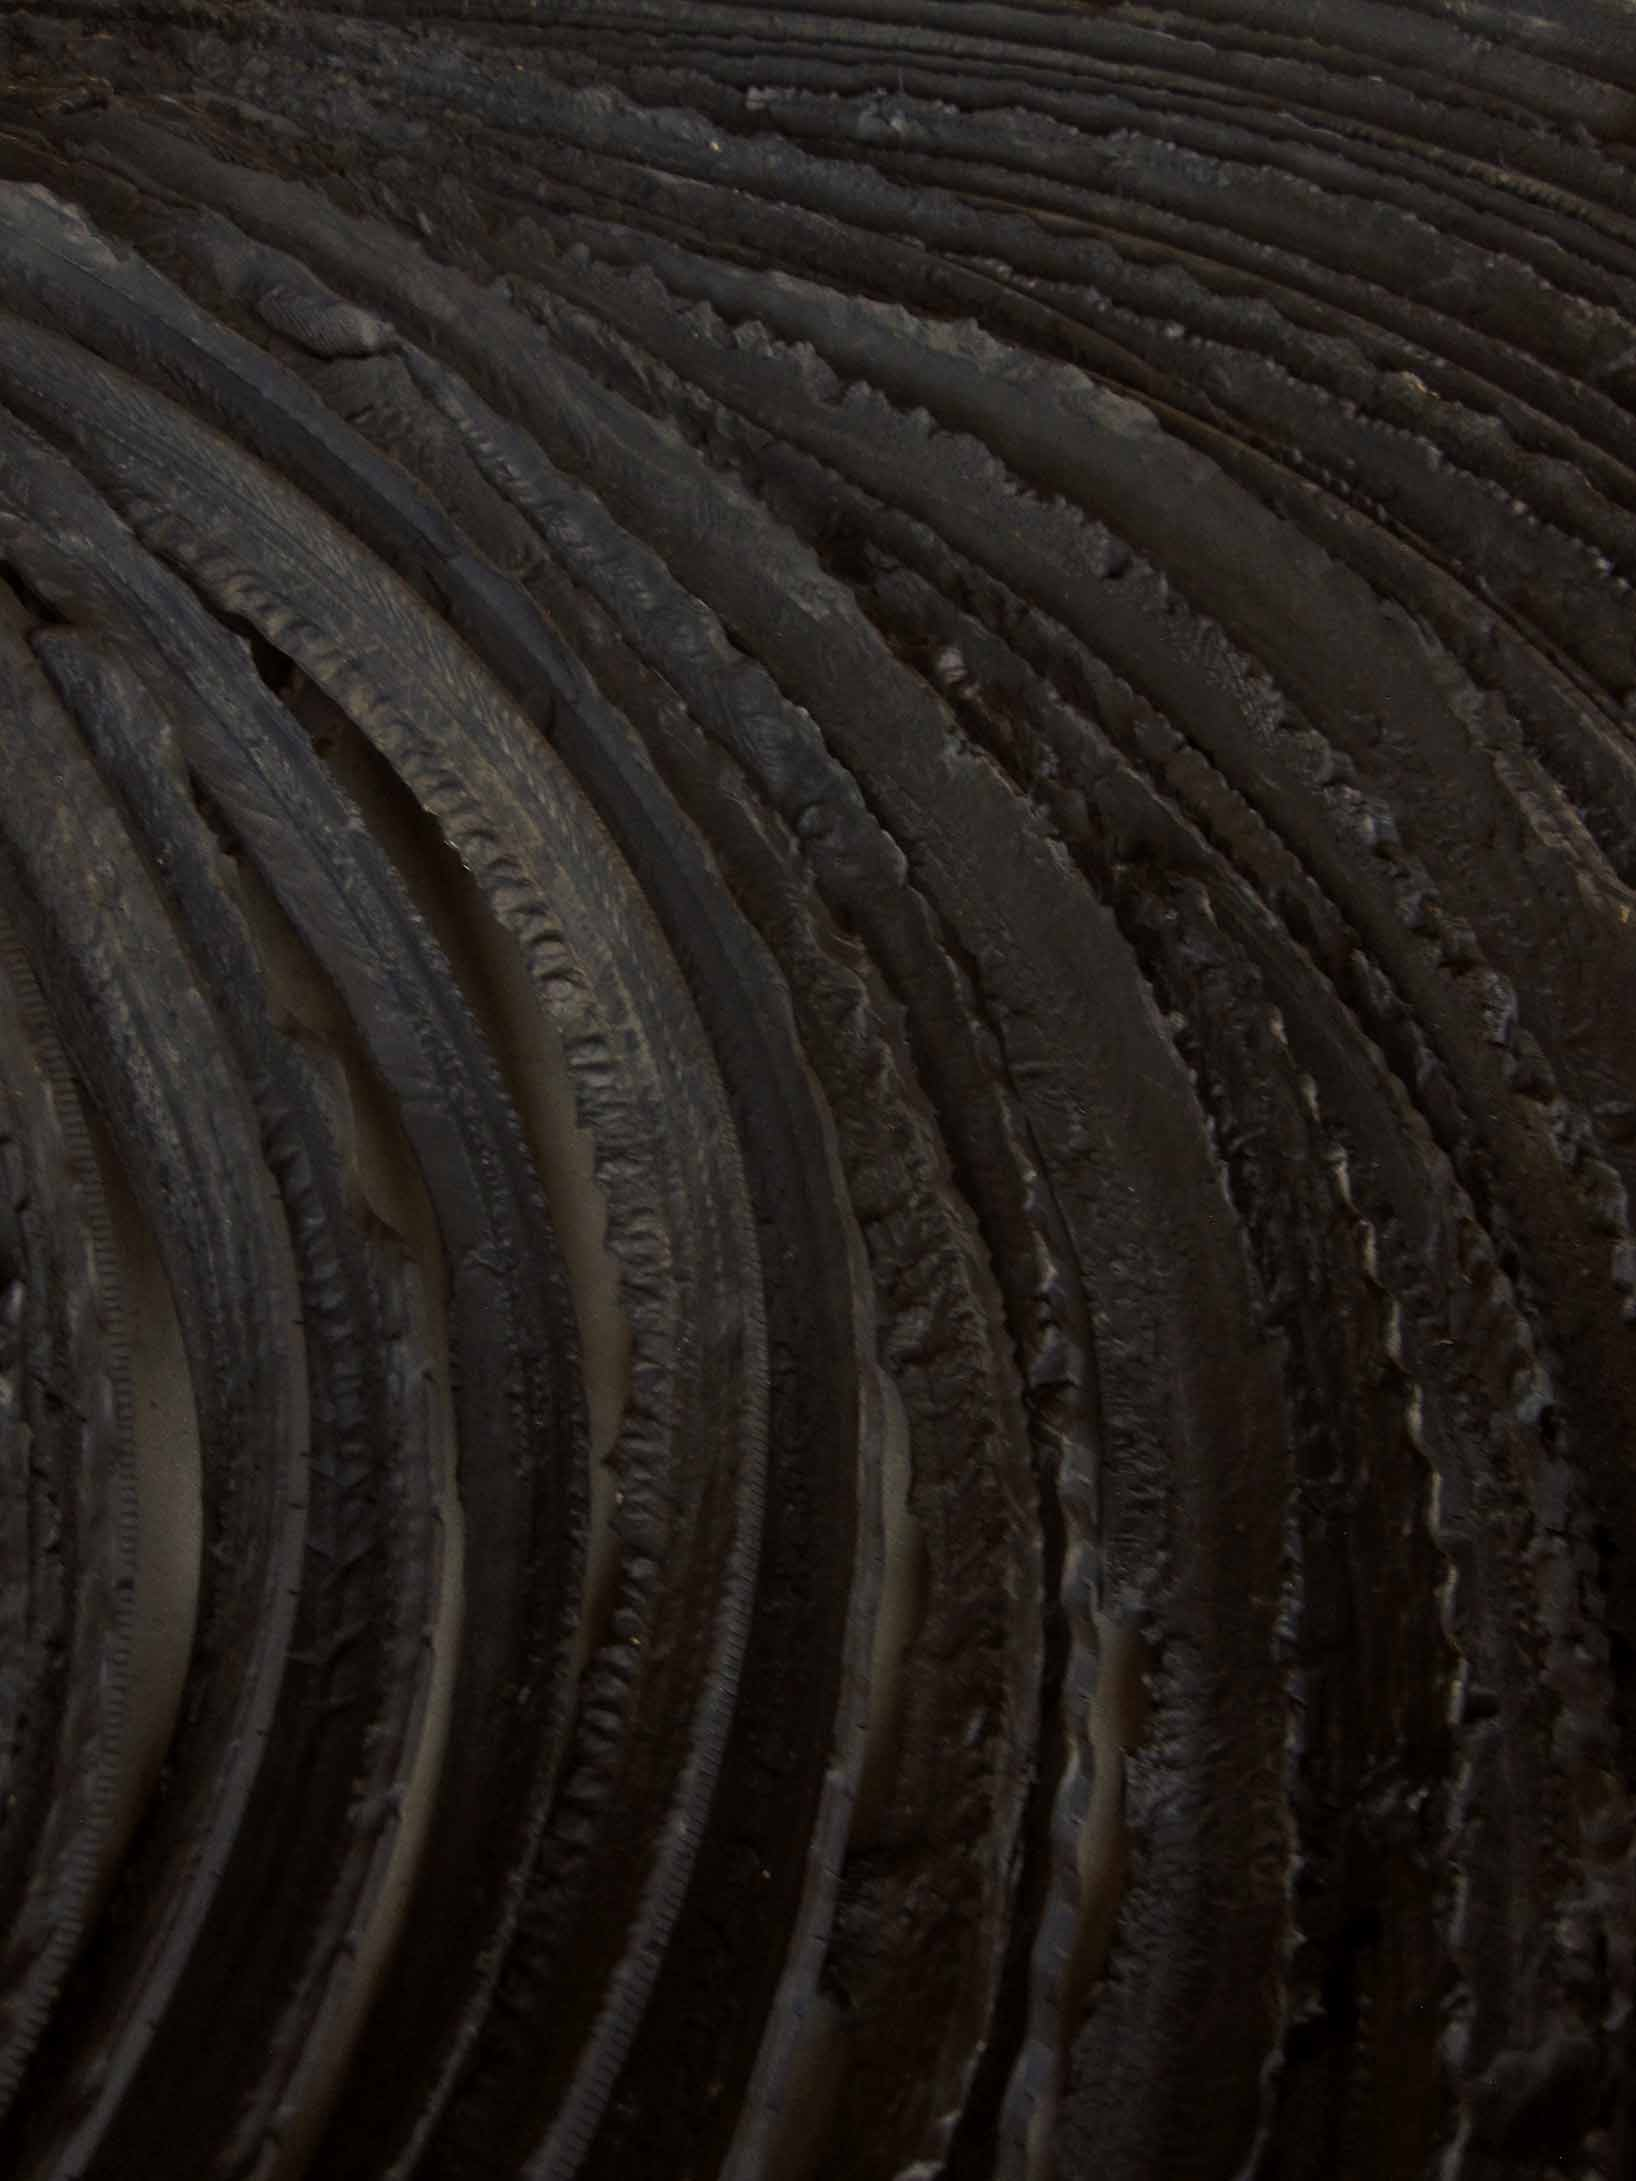 Swirl---Detail-4-A